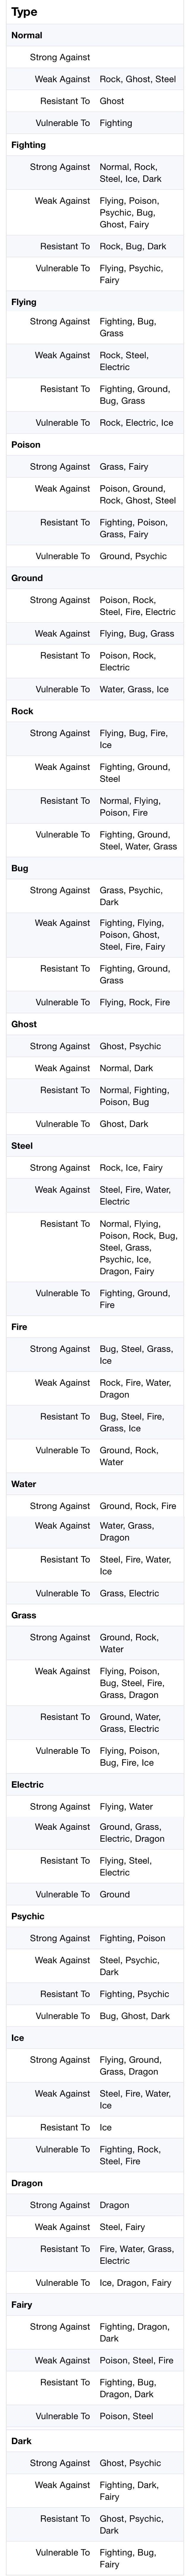 Pokémon Go Type Chart